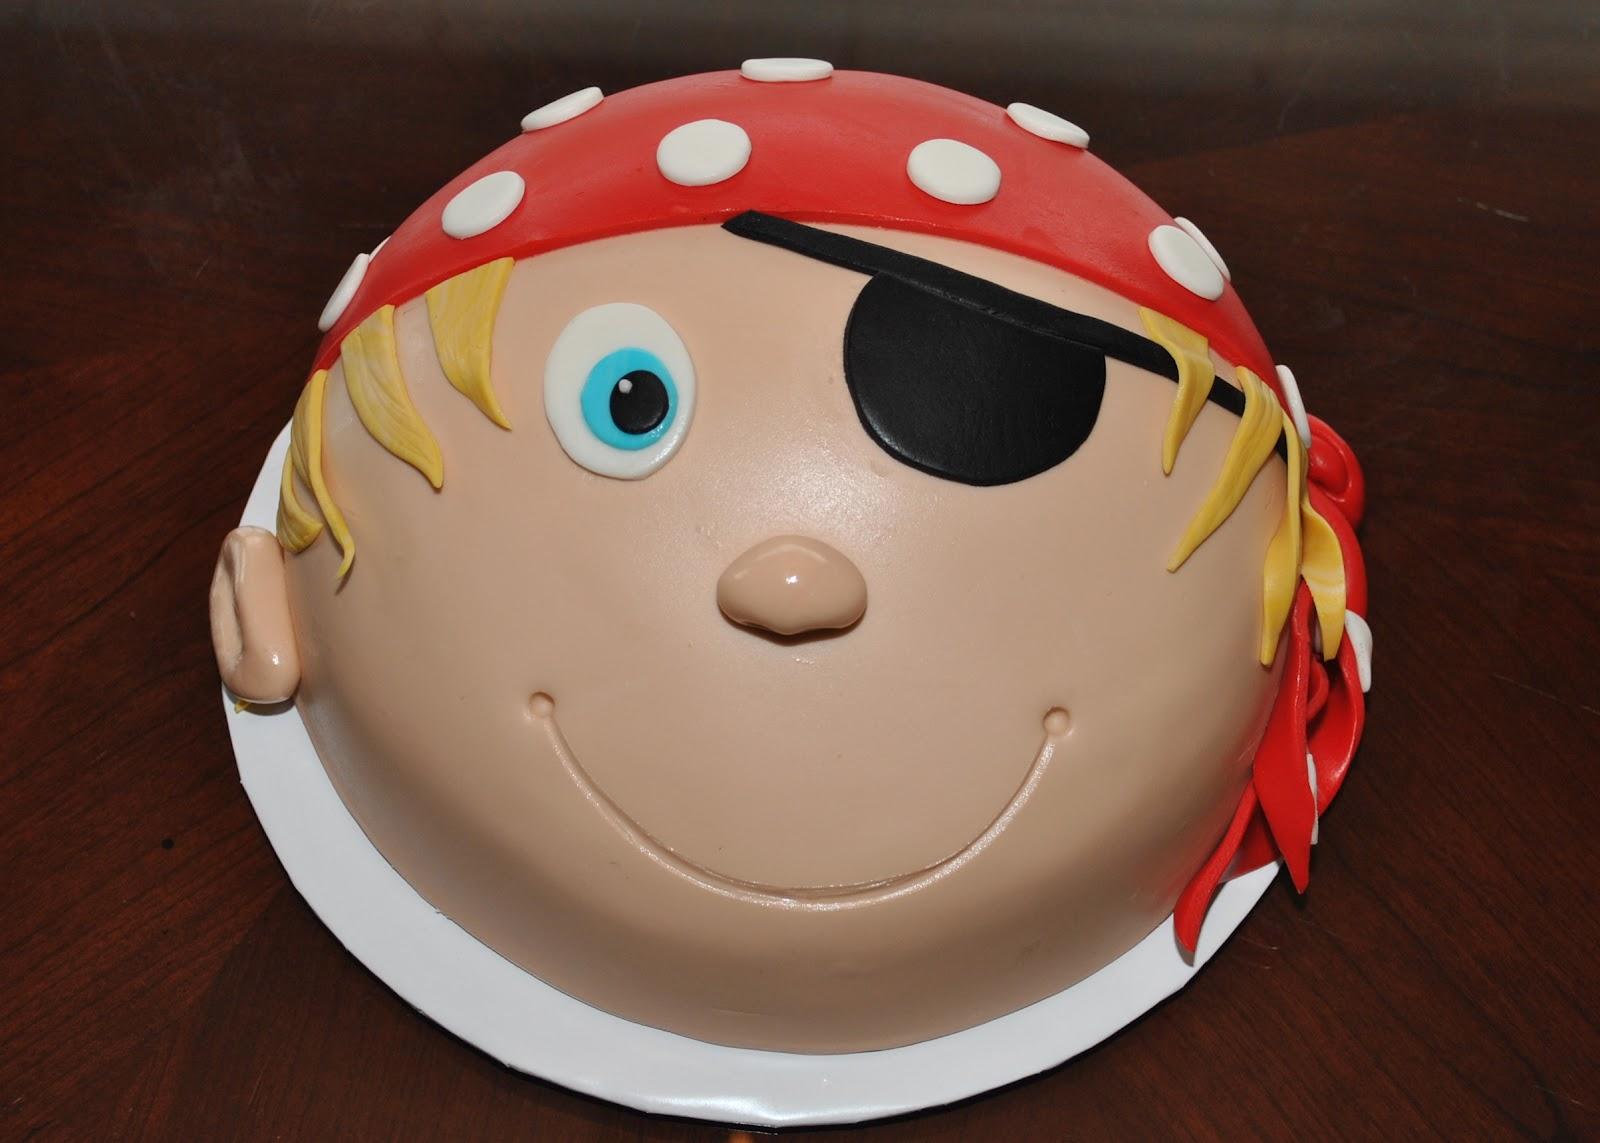 Hopes Sweet Cakes Soccer Caterpilla Dinos Pirates Pikes Peak